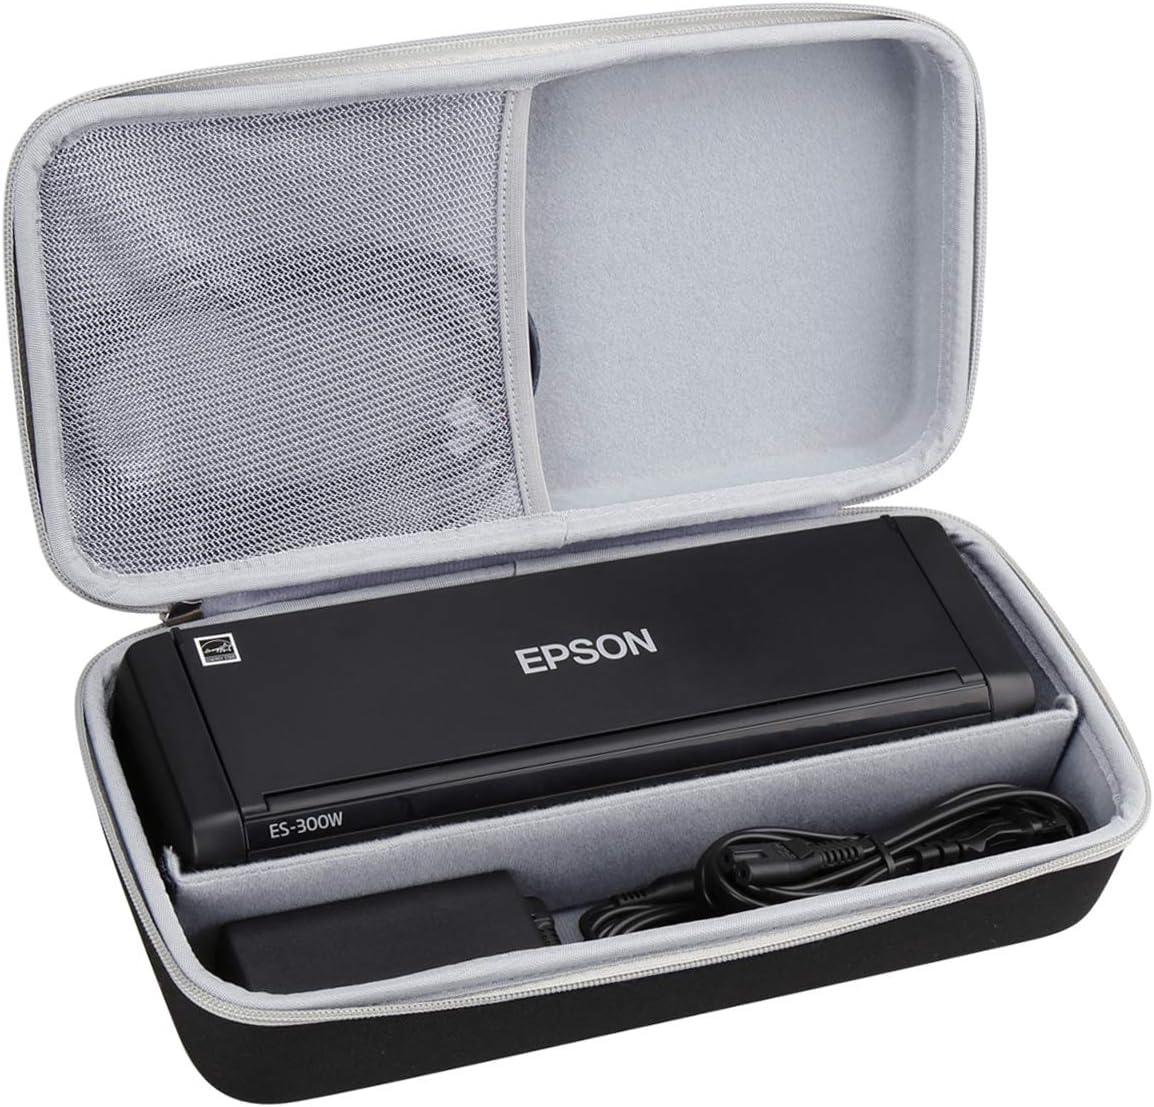 Aproca Hard Carry Travel Storage Case fit Epson Workforce ES-300W ES-200 Wireless Color Portable Document Scanner